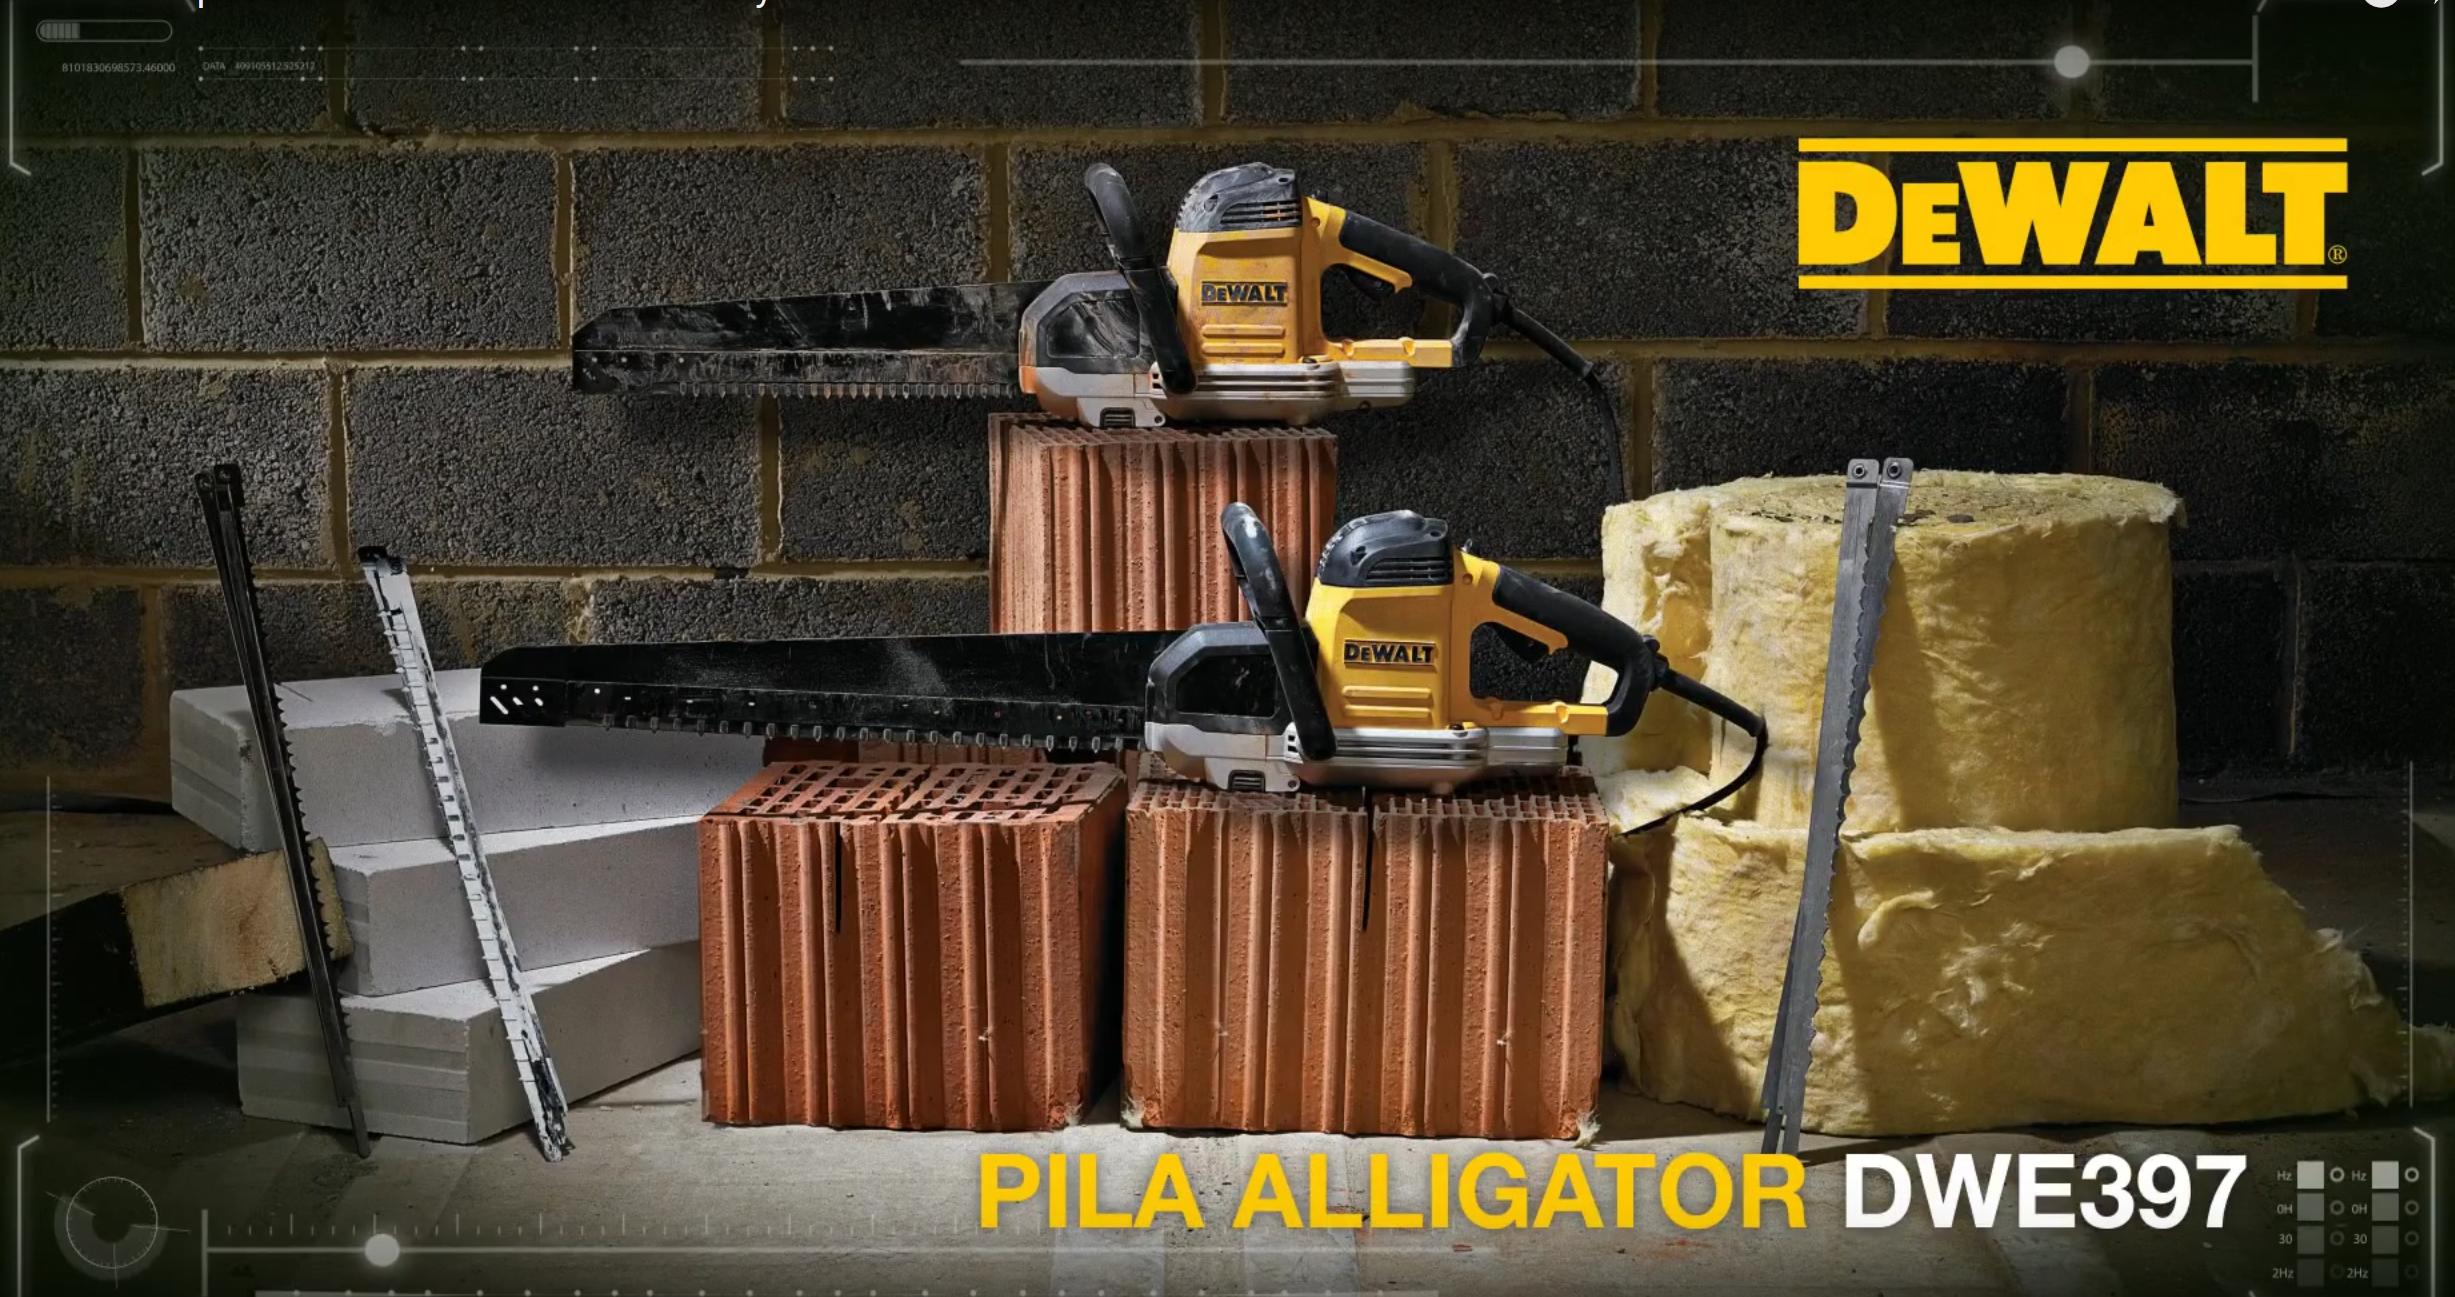 Pila Alligator